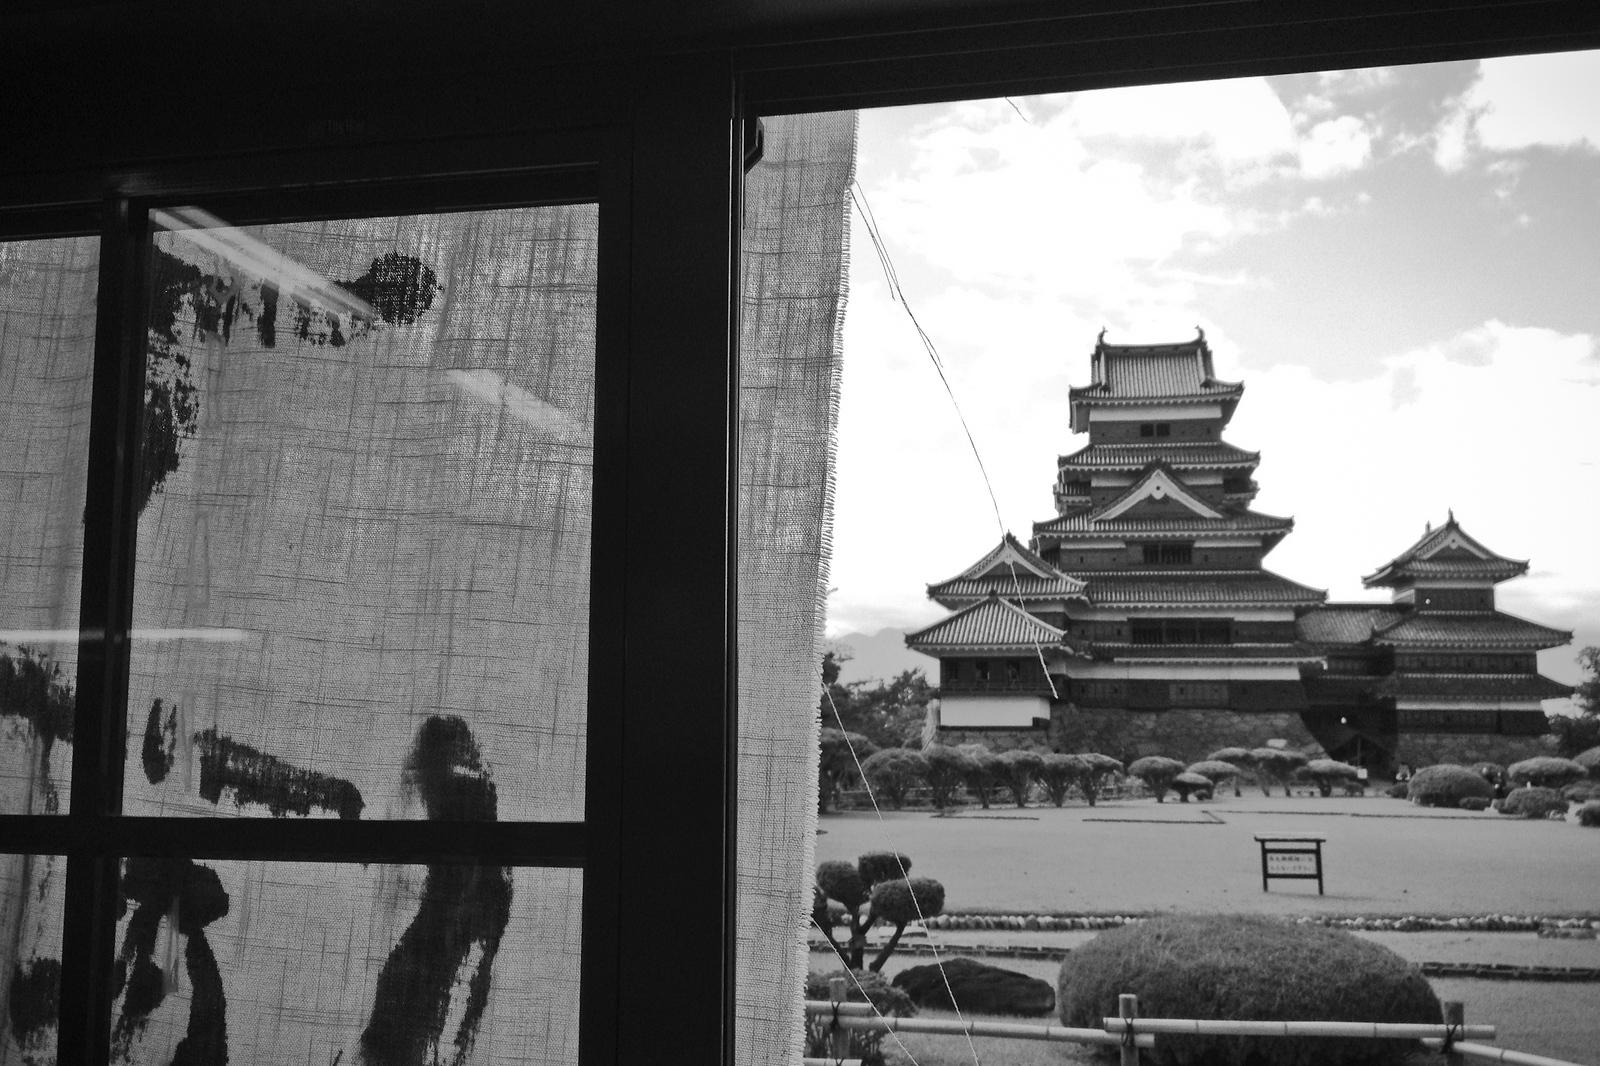 matsumoto castle bw